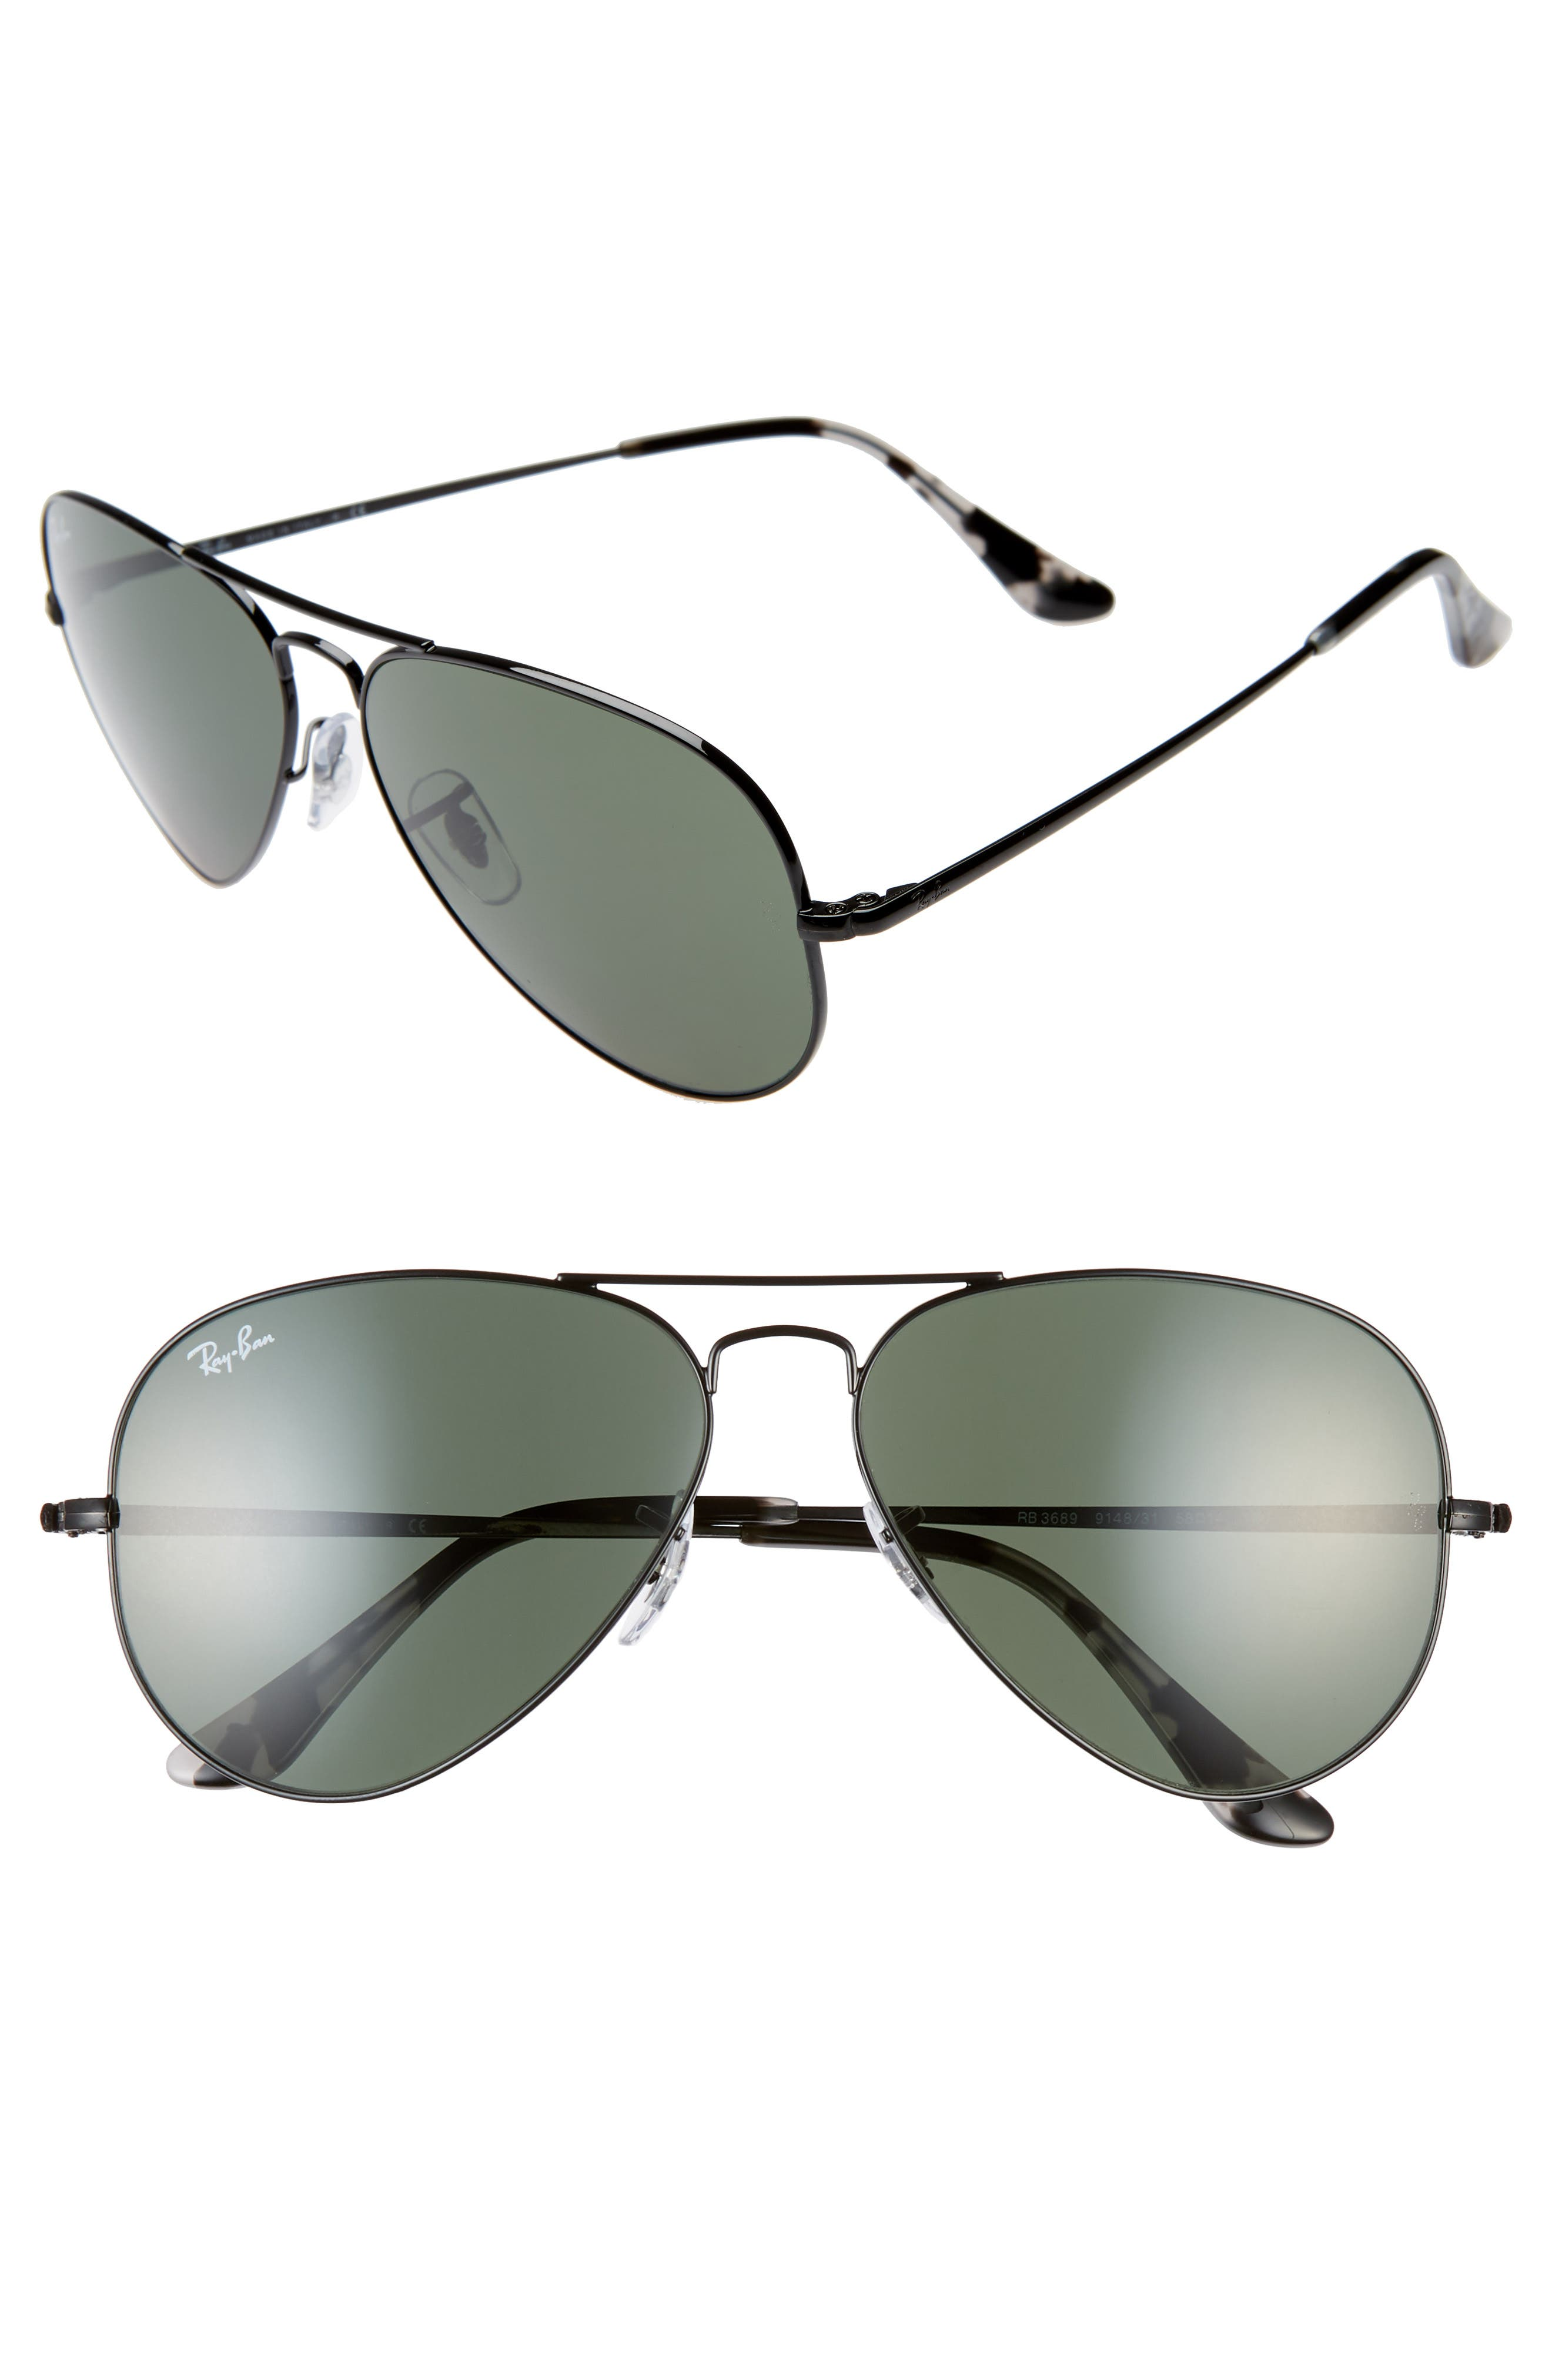 Ray-Ban 5m Aviator Sunglasses - Black/ Black Solid